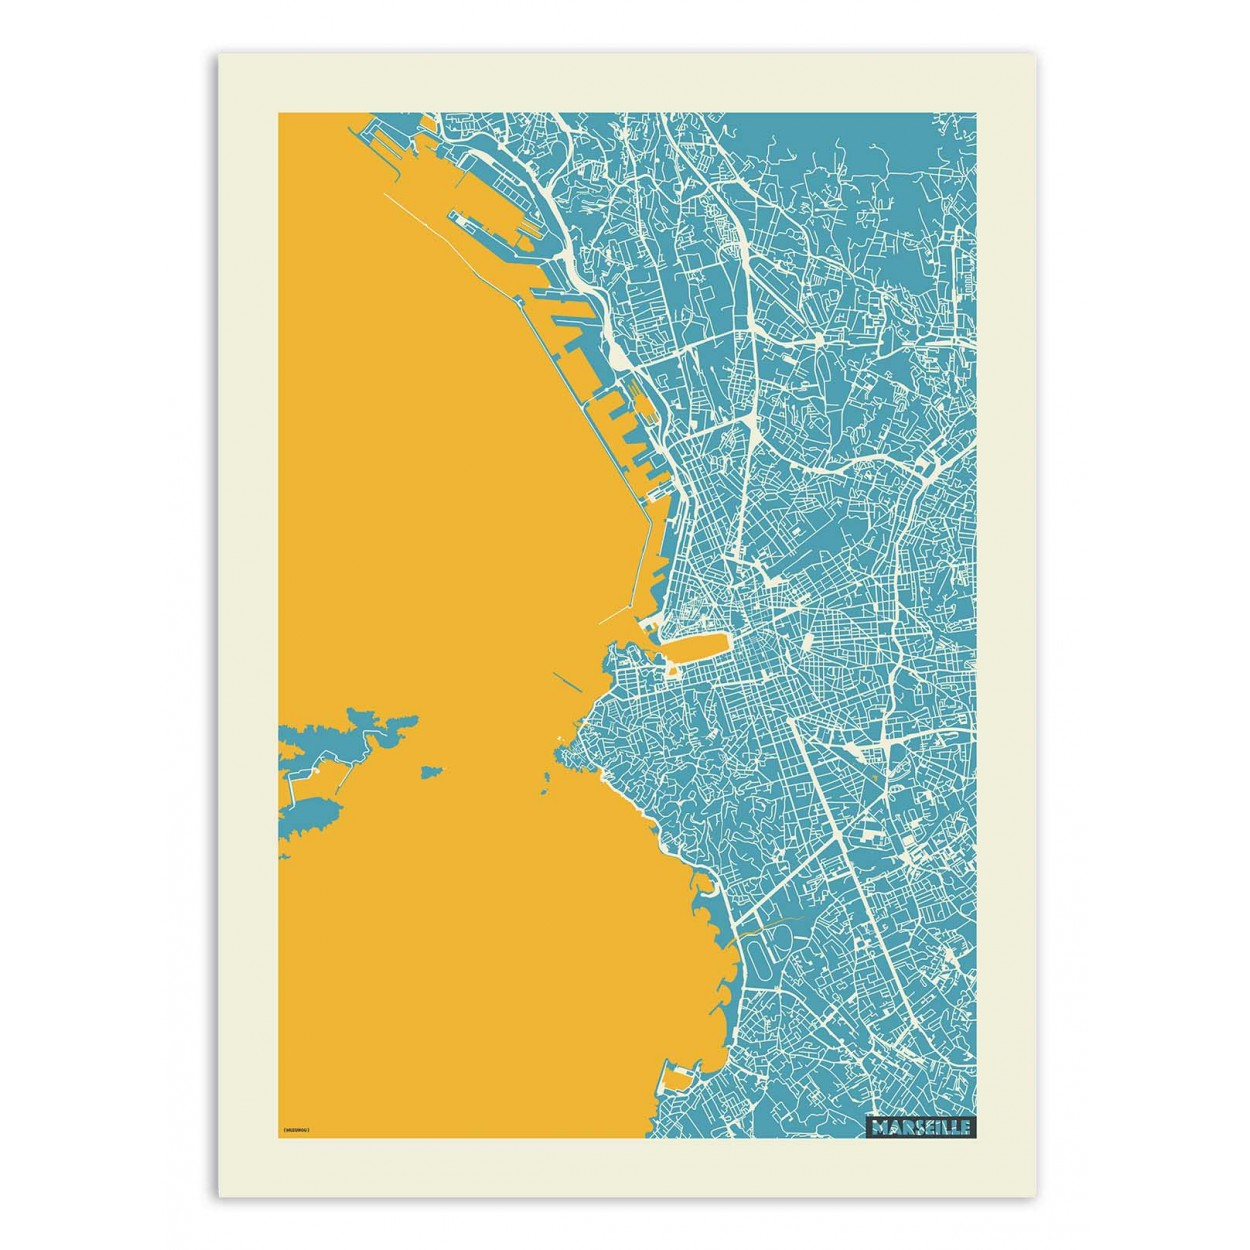 MARSEILLE YELLOW AND BLUE MAP - MUZUNGU -  Affiche d'art 50 x 70 cm